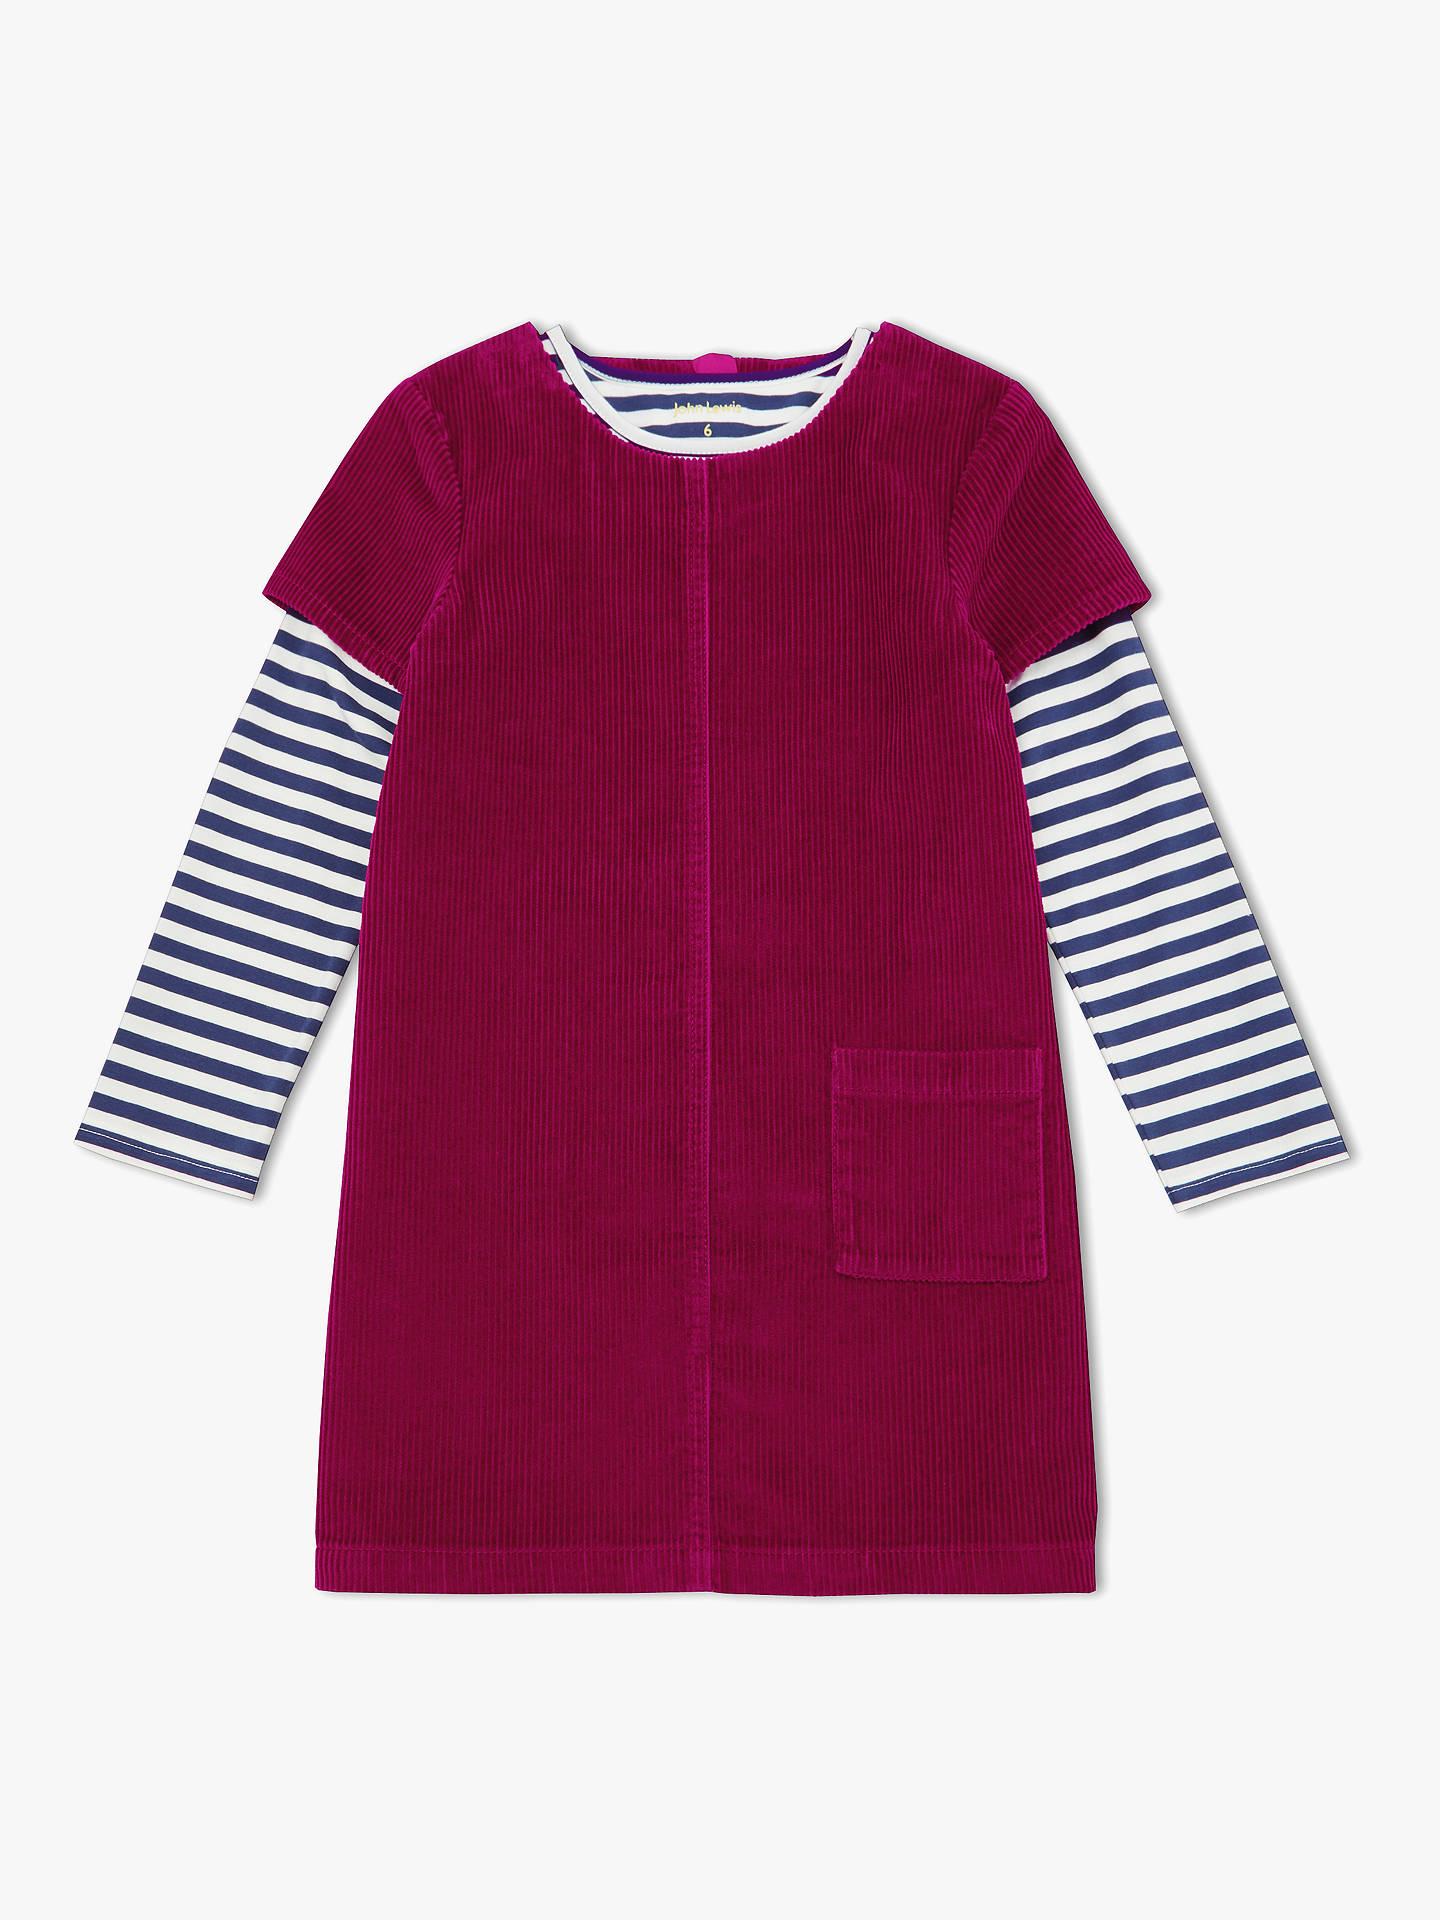 de9d1db51 Buy John Lewis & Partners Girls' Corduroy Pinafore Dress And T-Shirt Set,  ...